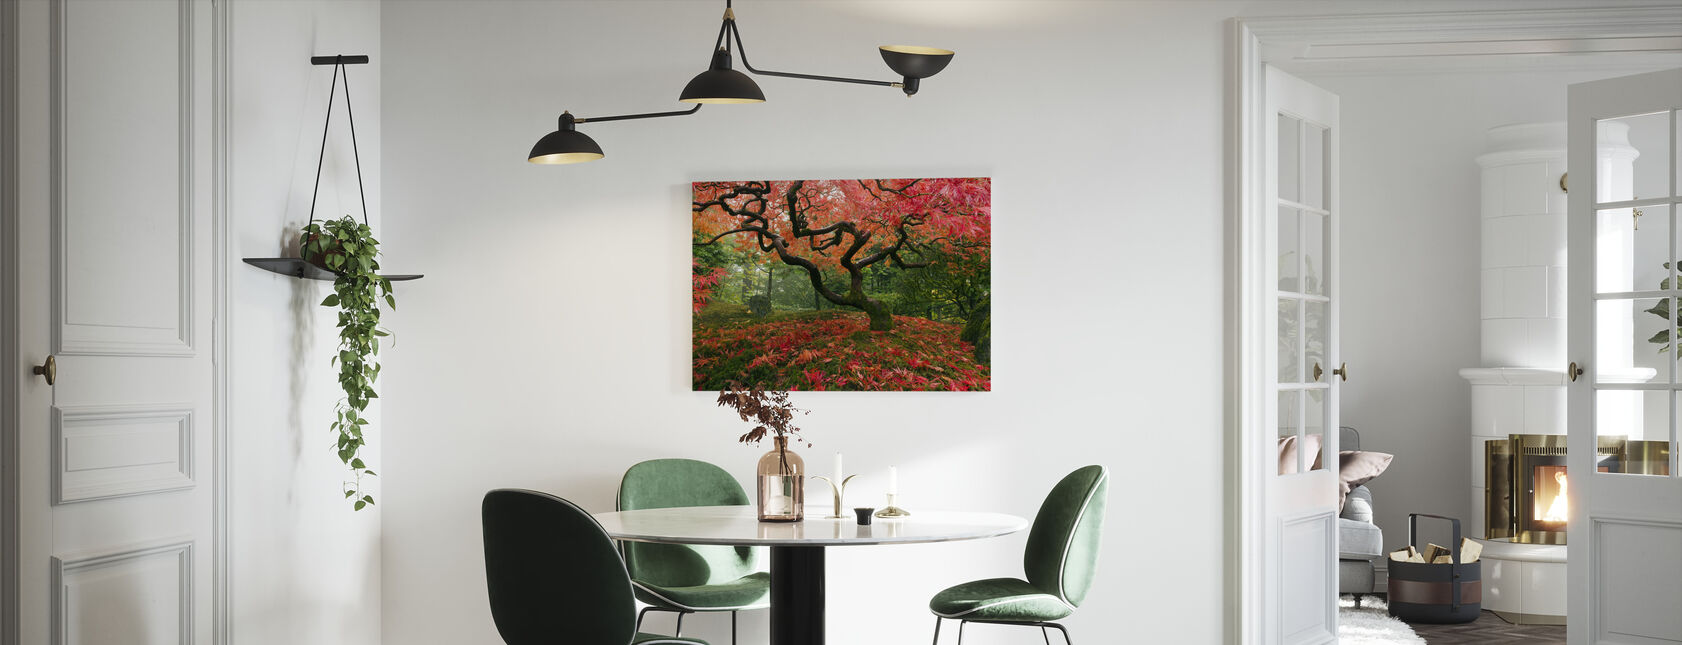 Japansk lönnträd - Canvastavla - Kök